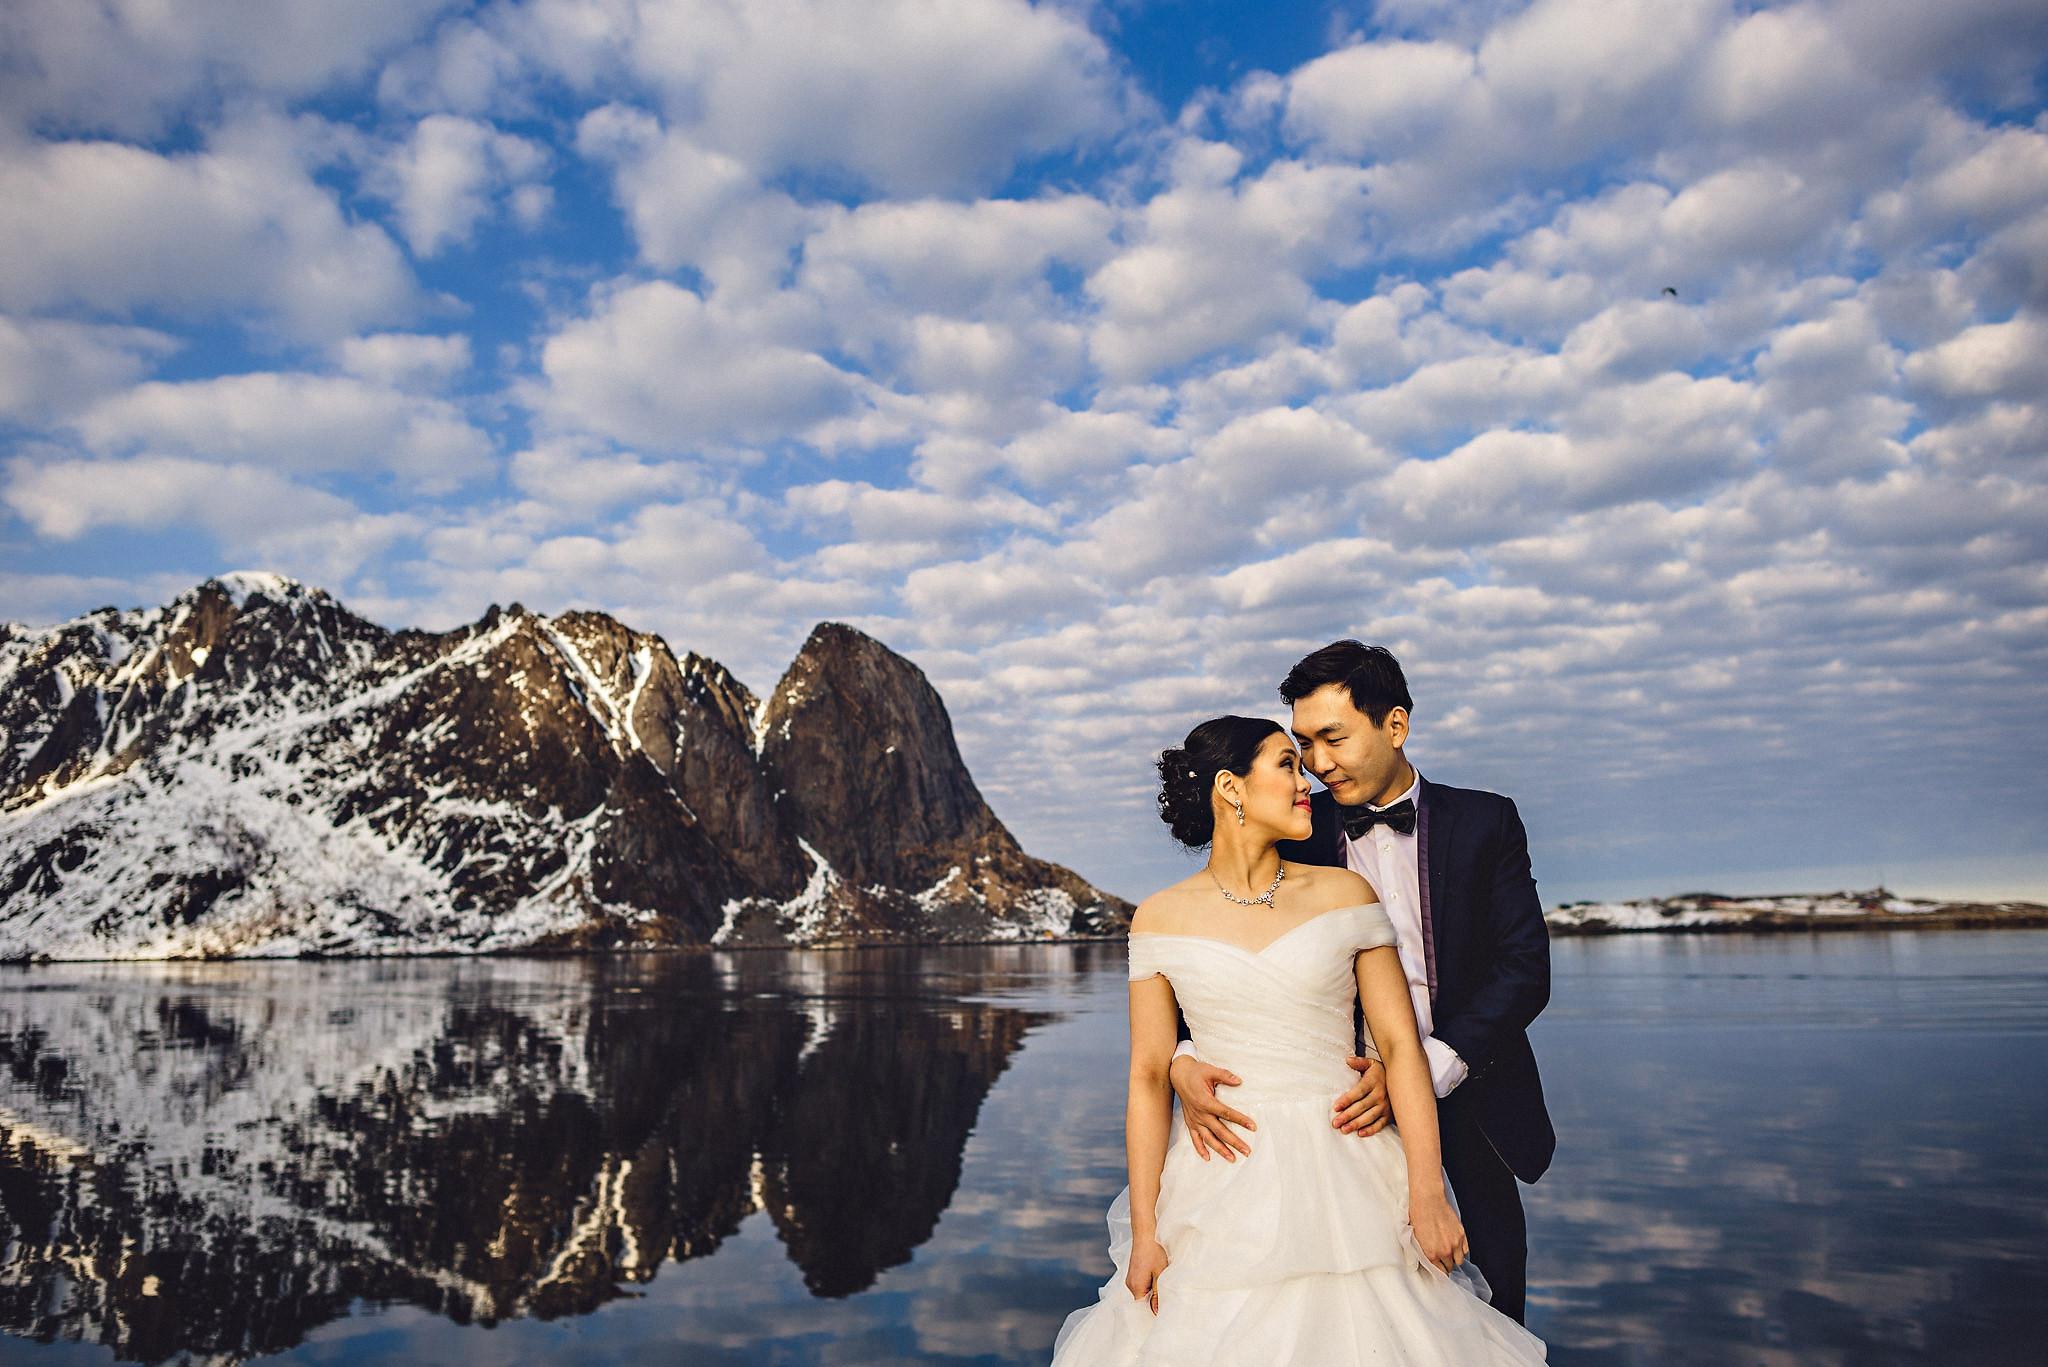 Eirik Halvorsen Gloria and Eugene Lofoten pre wedding-25.jpg